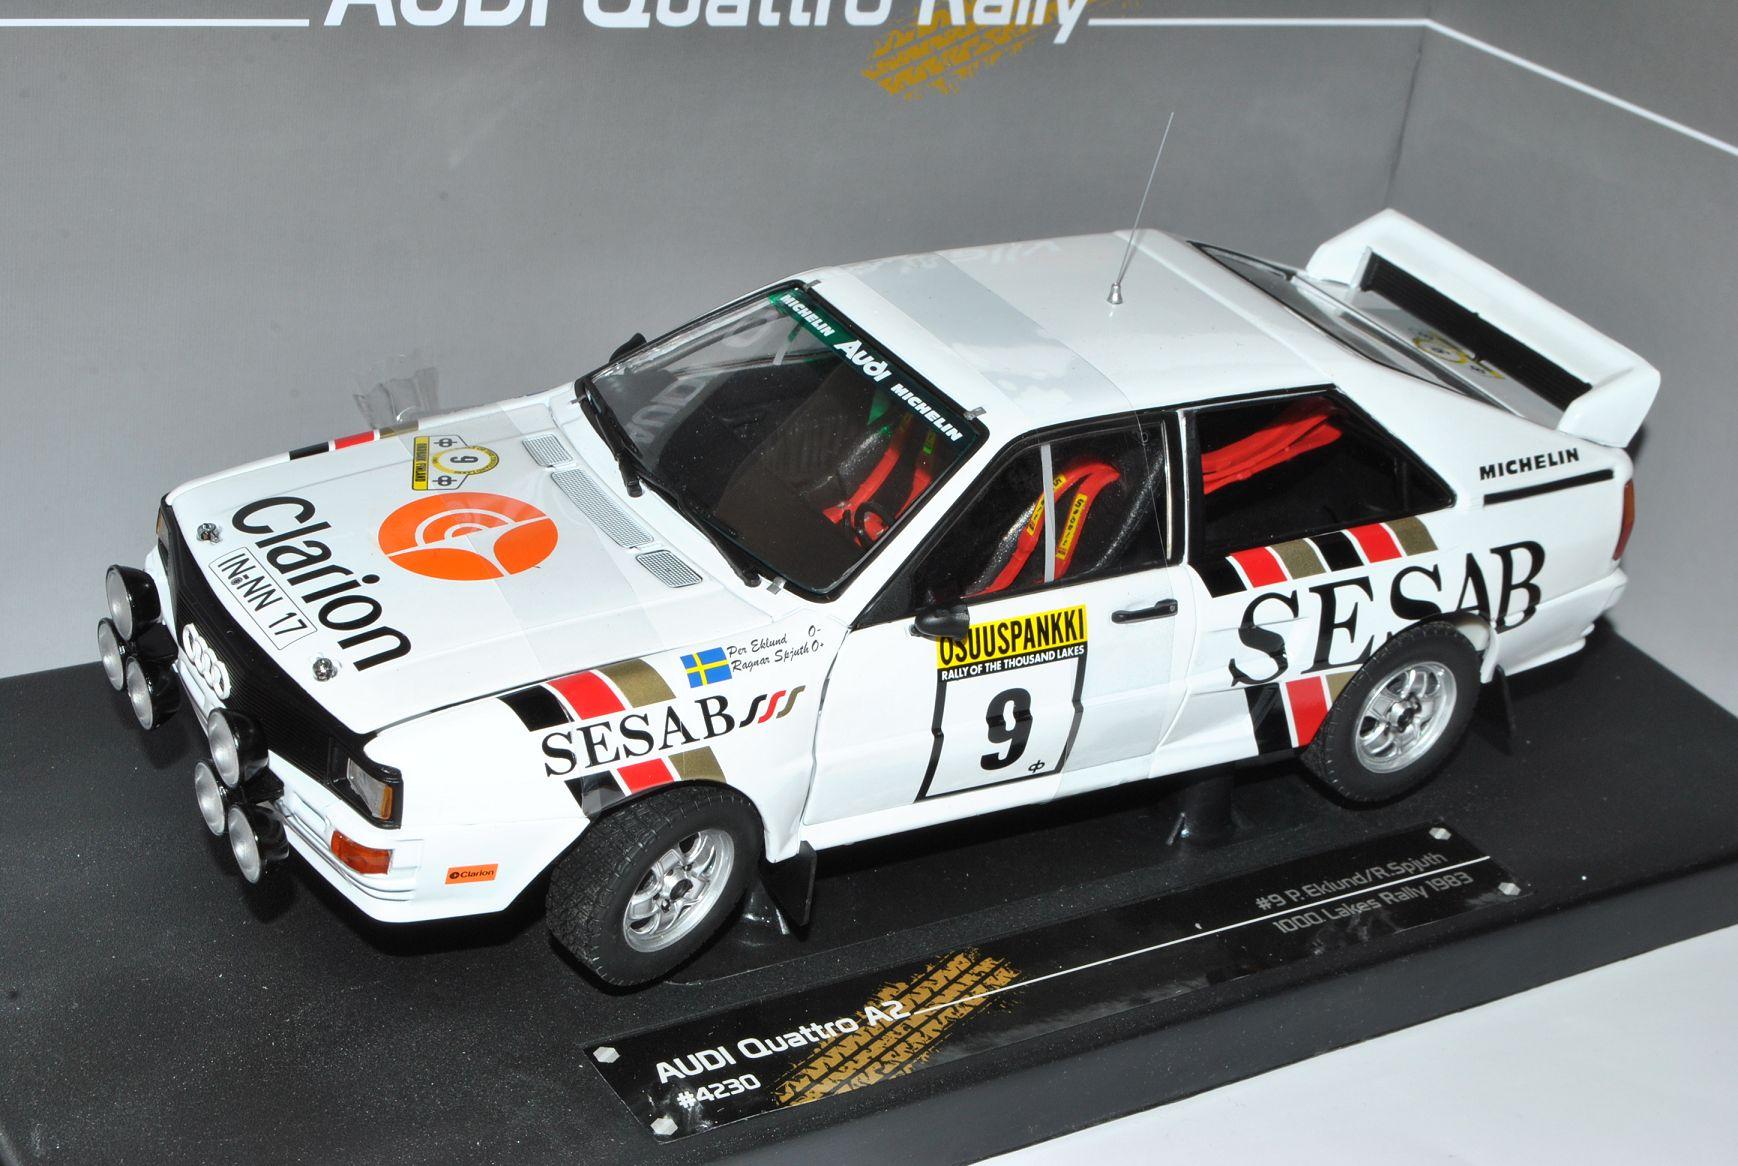 Audi Quattro A2 SESAB SESAB SESAB Nr 9 1000 Seen Rally 1983 Eklund Spjuth 1 18 Sun Star Mo.. 5b6f1d